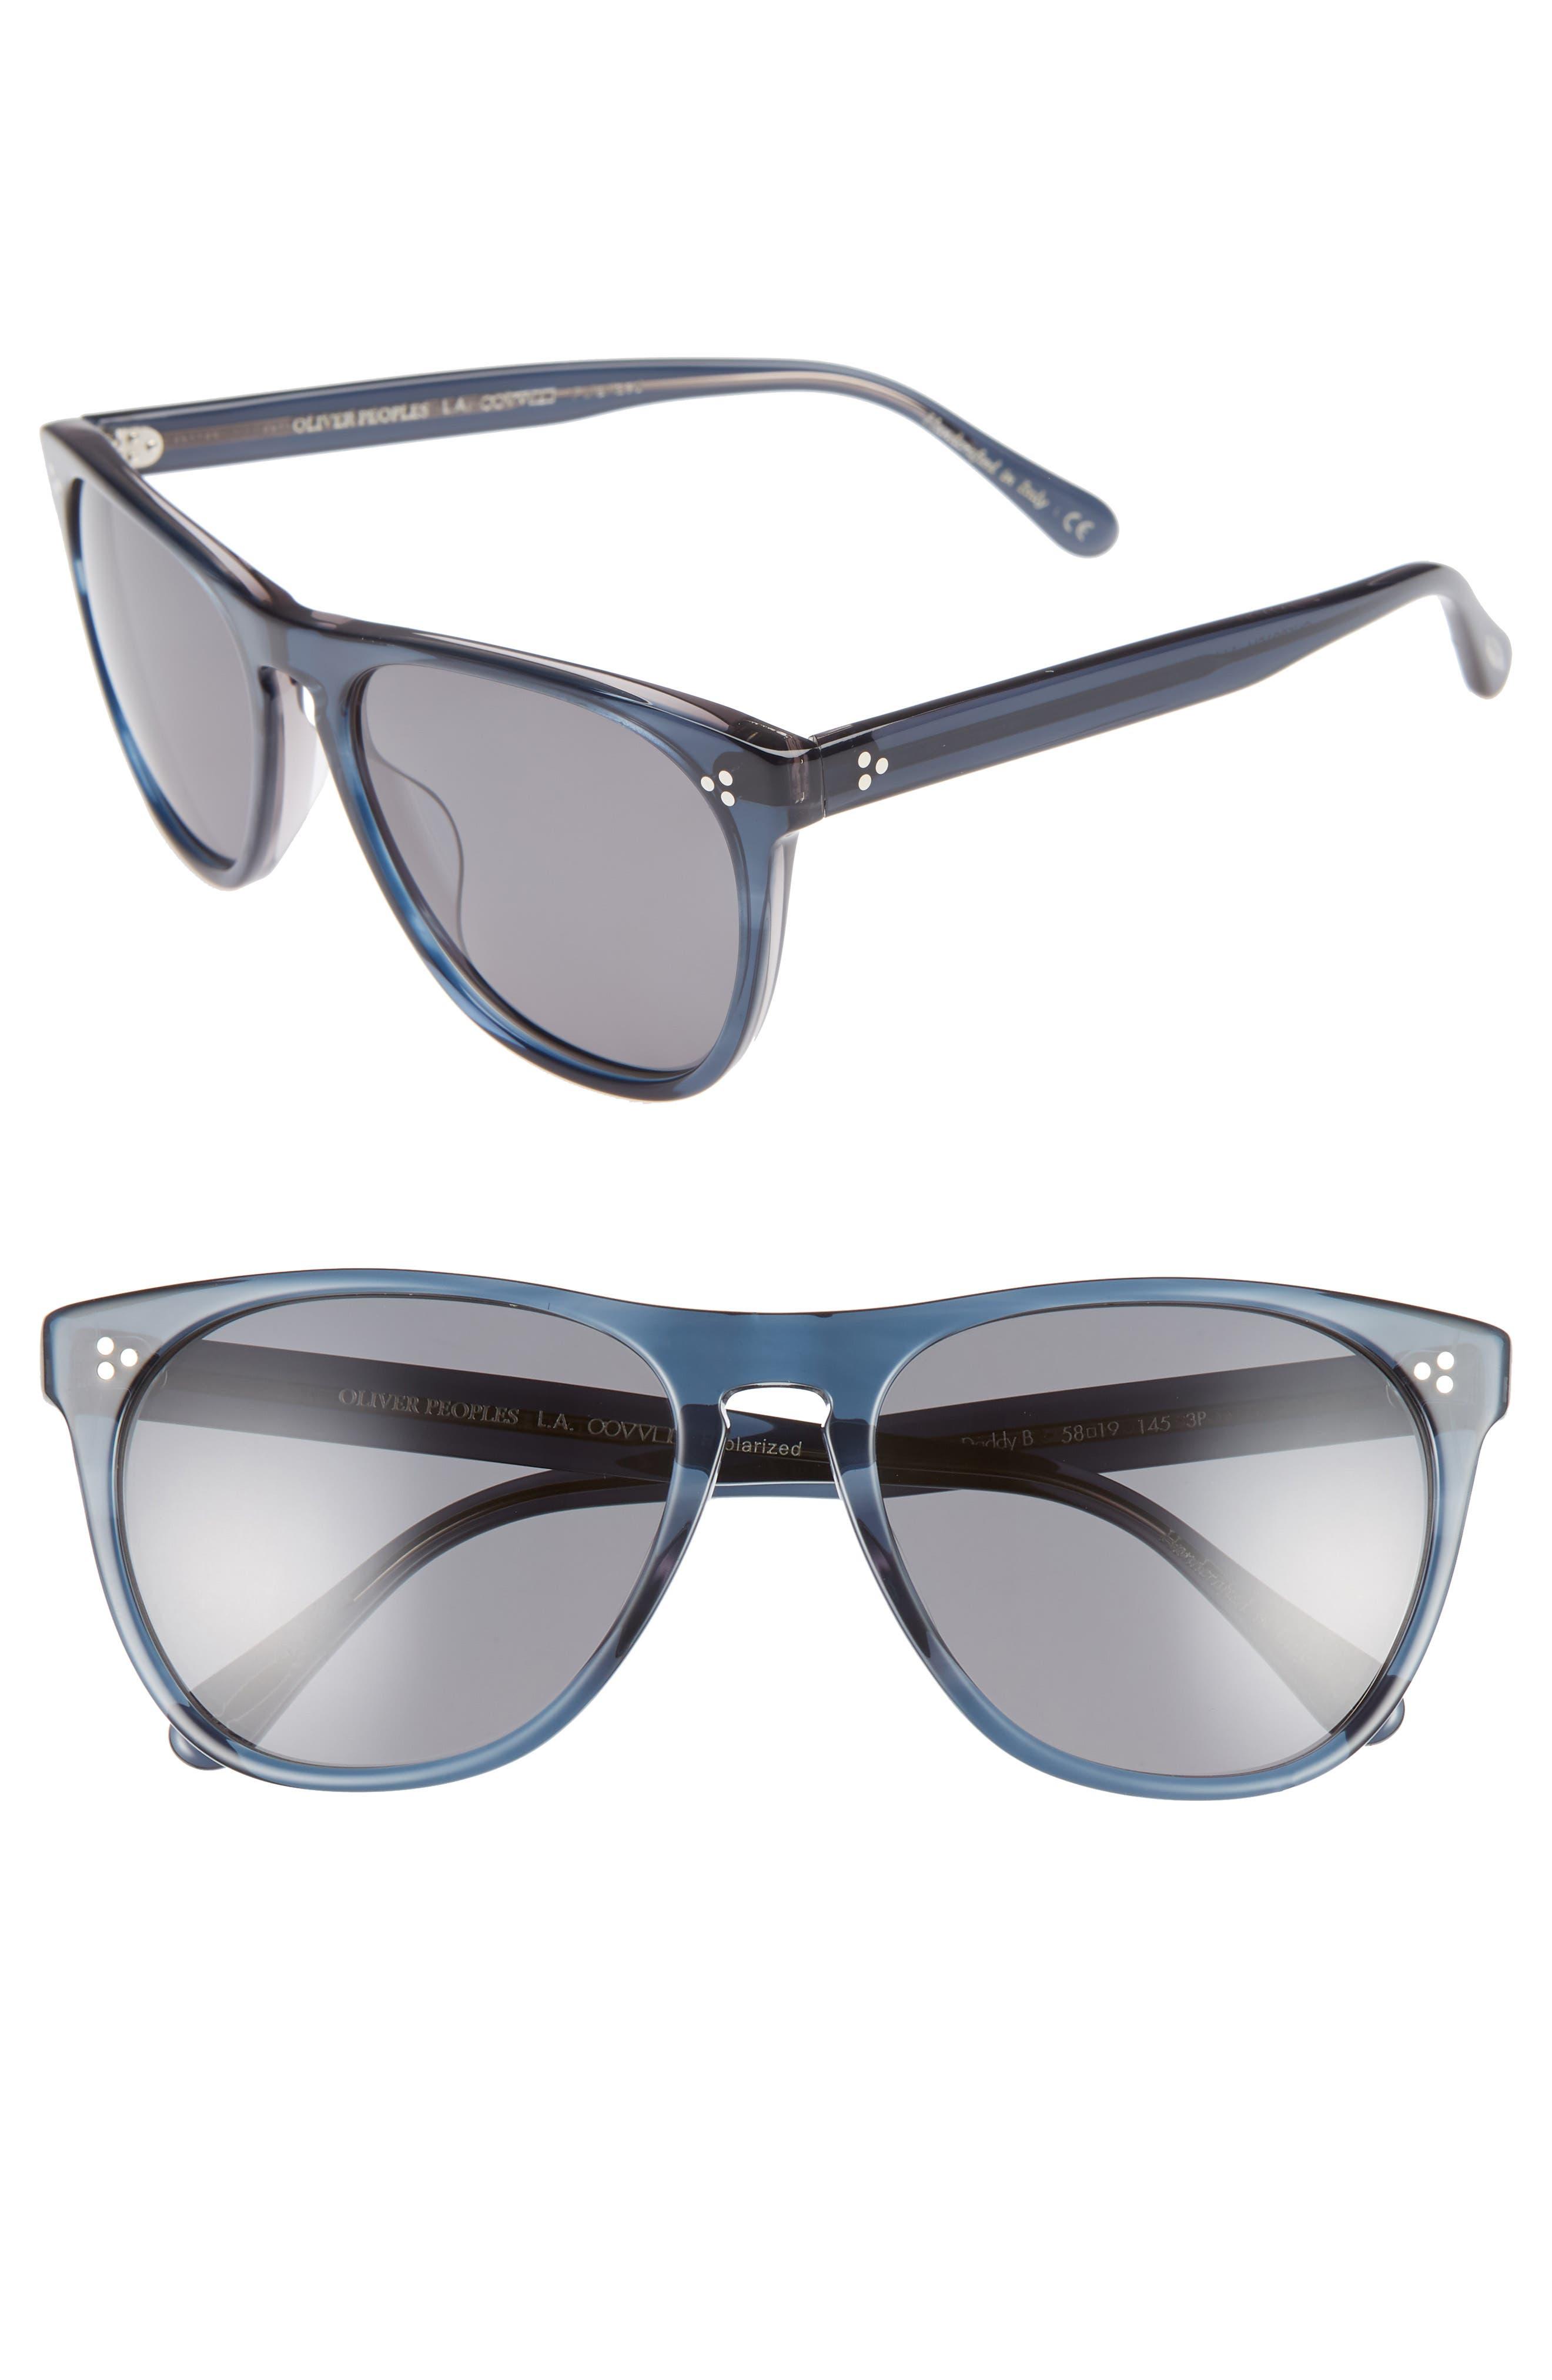 OLIVER PEOPLES Daddy B 58Mm Polarized Sunglasses - Indigo Havana